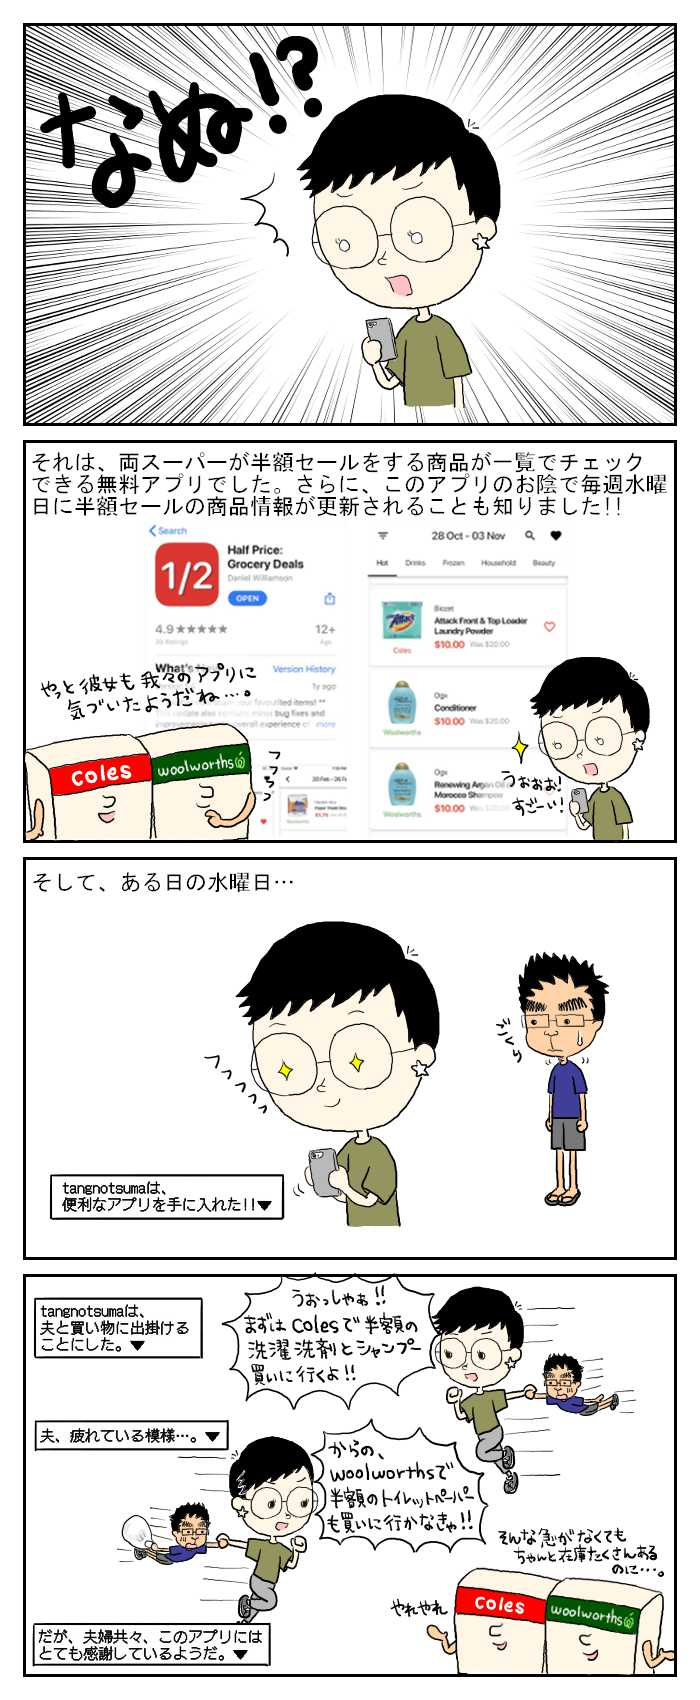 77_Useful App_jp_2